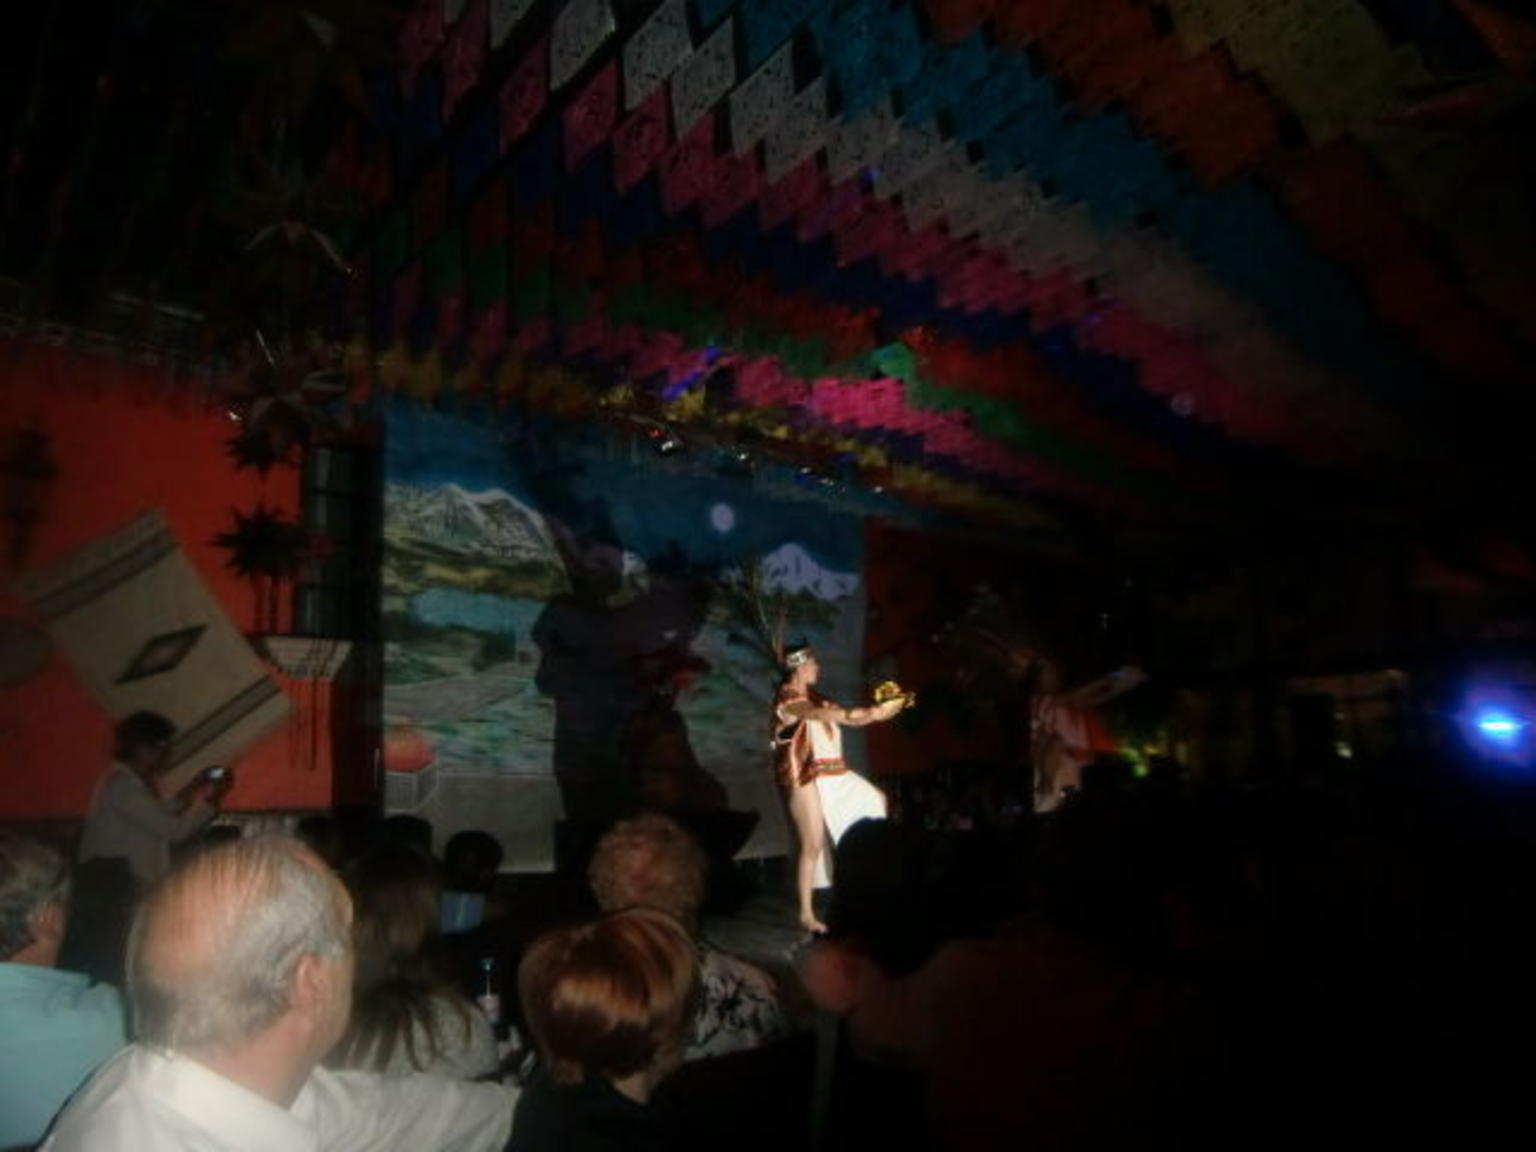 MORE PHOTOS, Garibaldi Night Tour